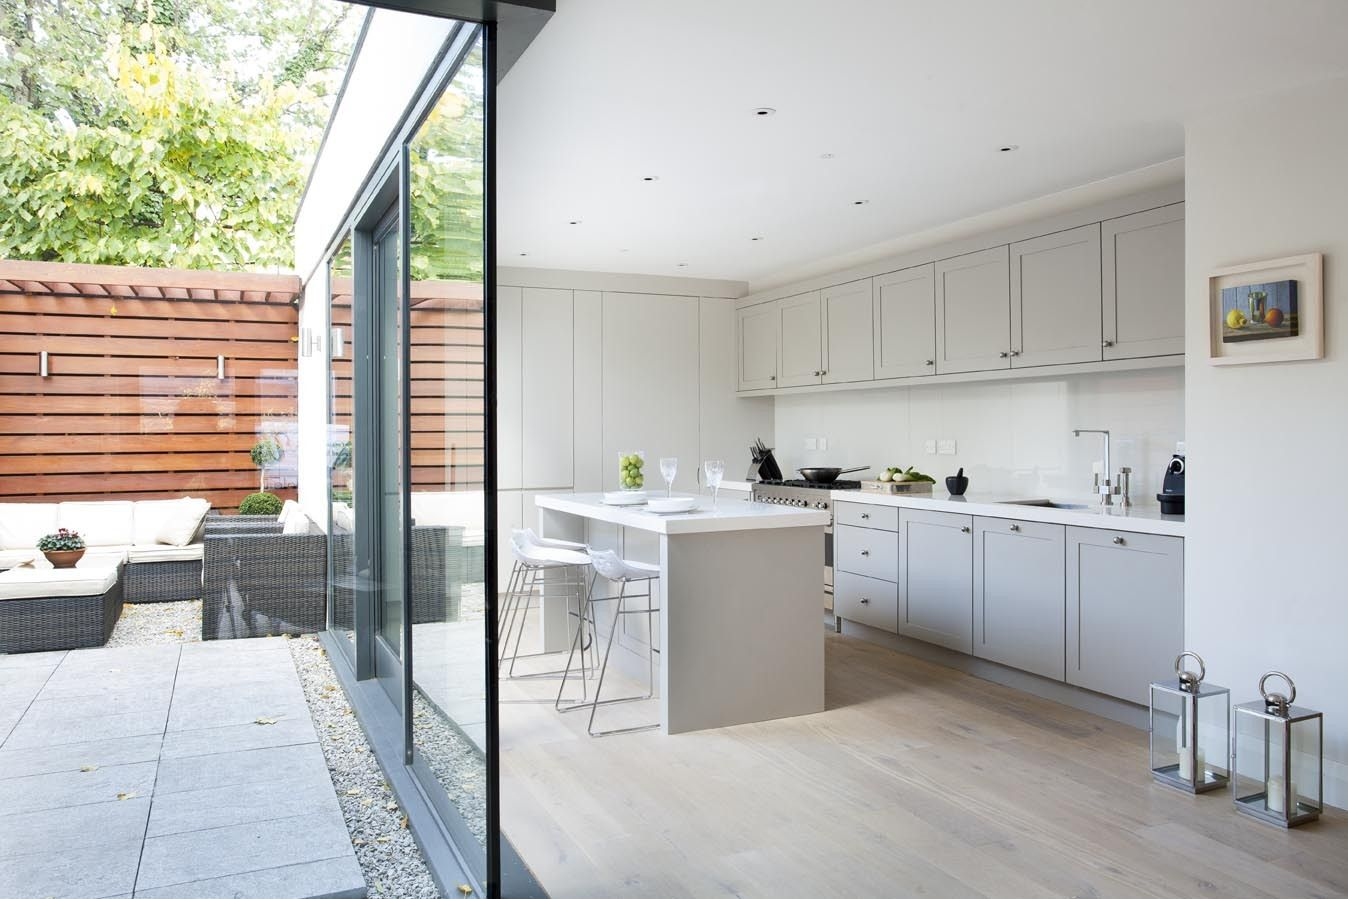 French grey kitchen with white washed oak flooring. Grey